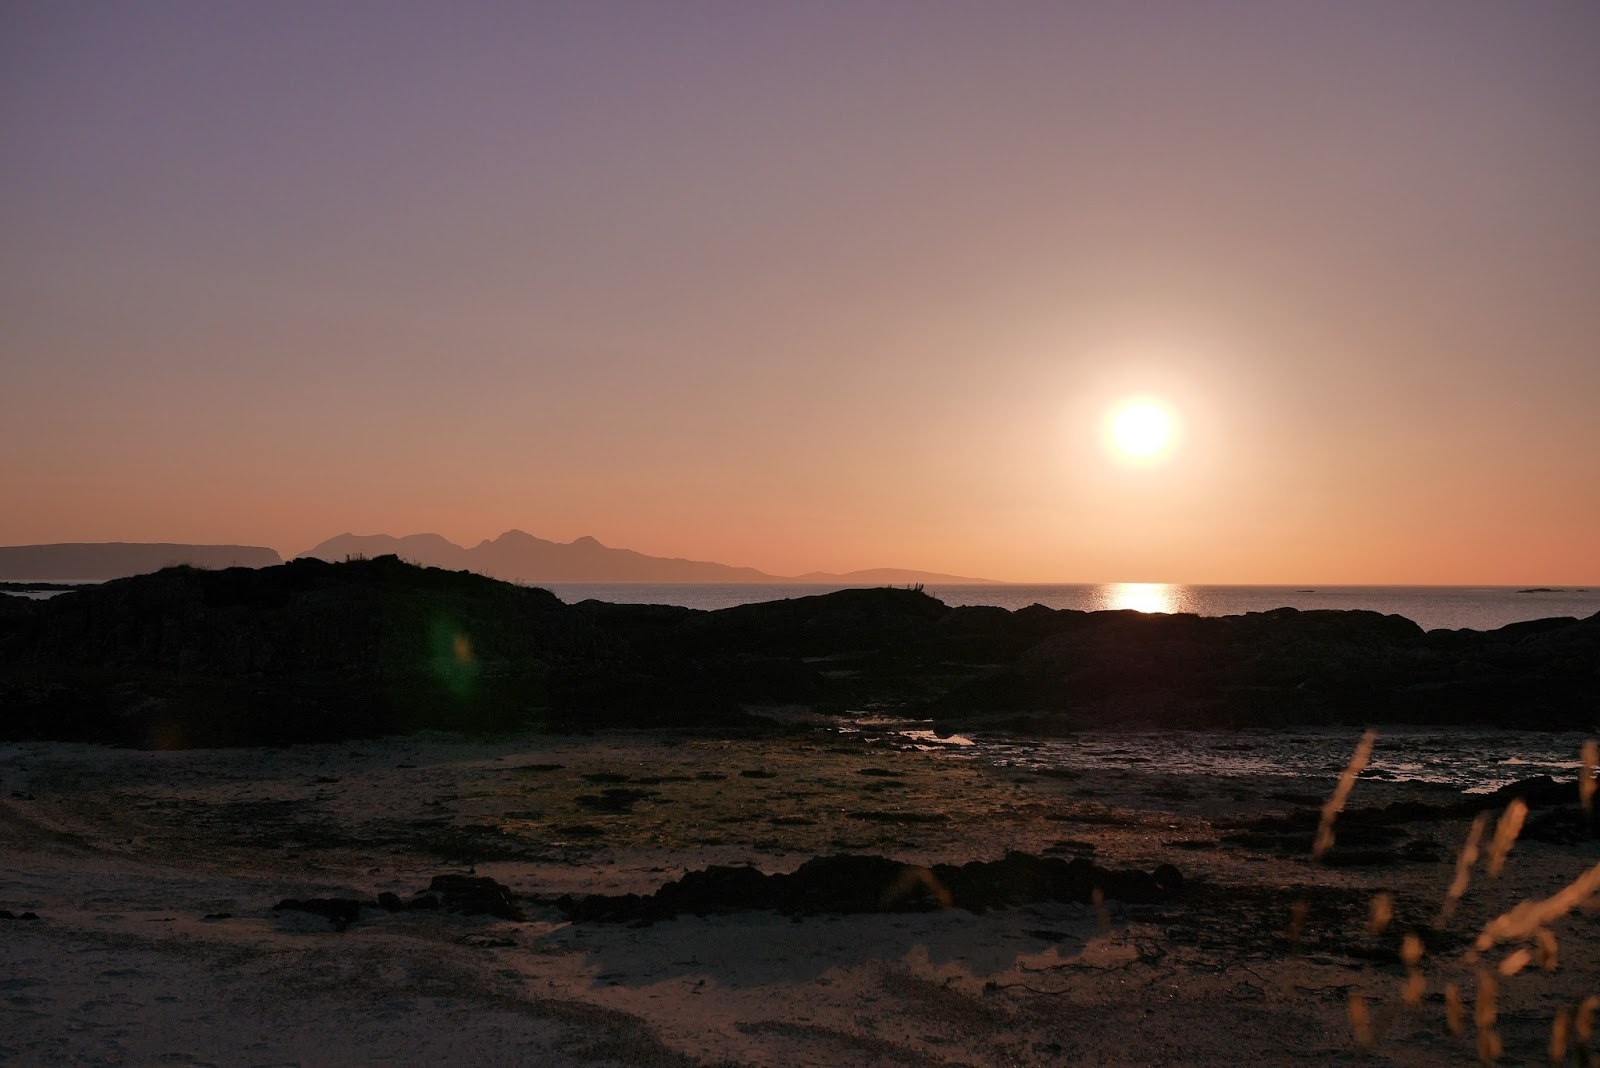 Sunset in Scotland Arisaig, www.CalMCTravels.com, The best campsites in Scotland